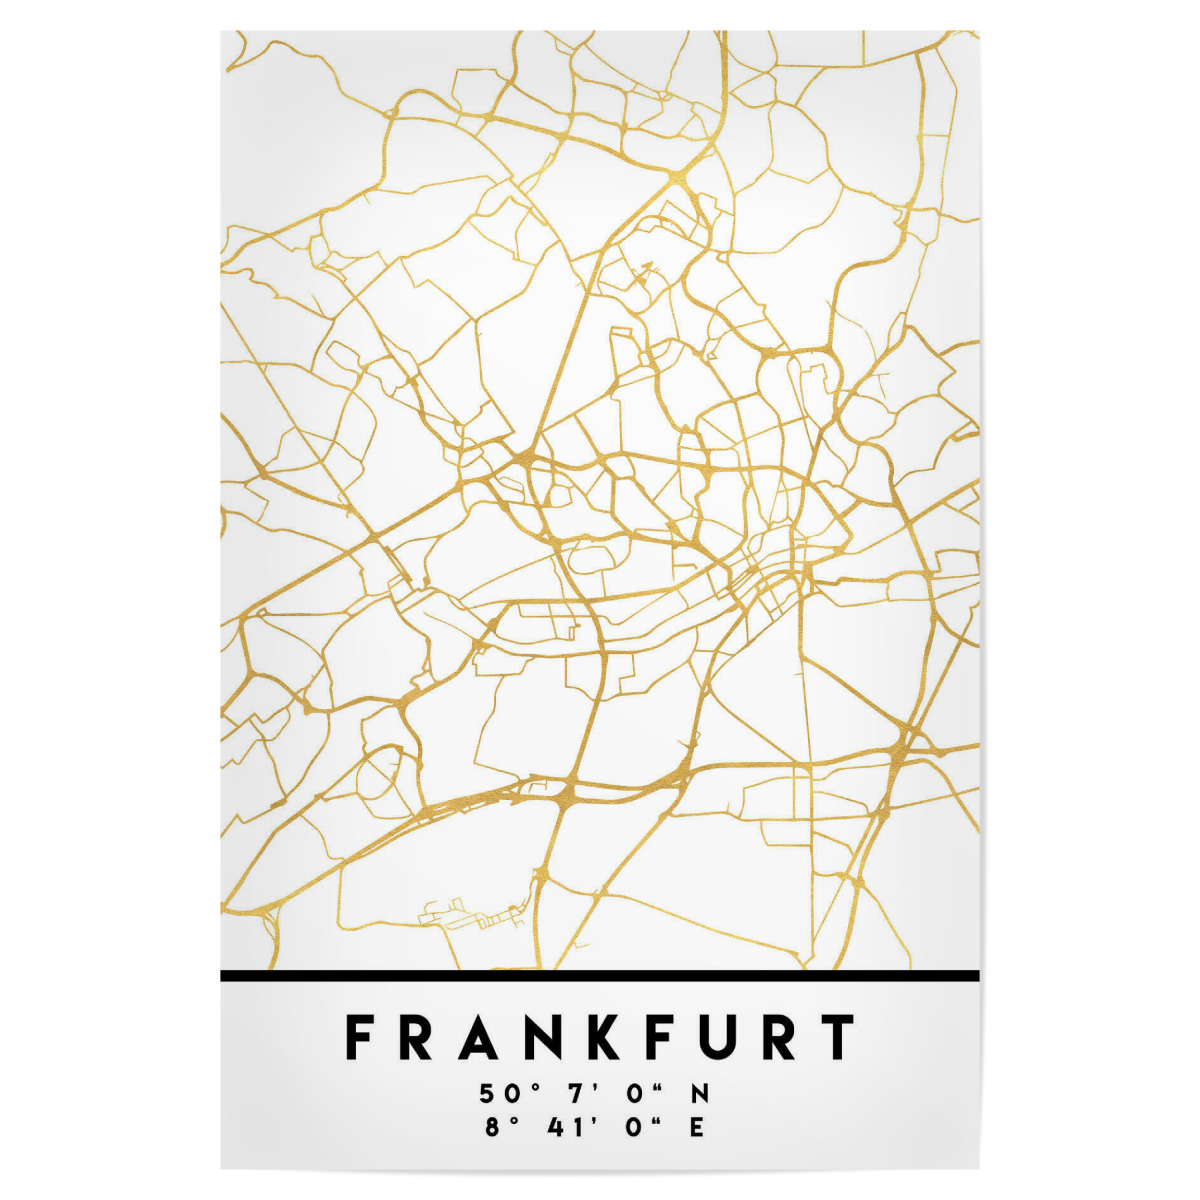 FRANKFURT GERMANY STREET MAP ART als Poster bei artboxONE kaufen